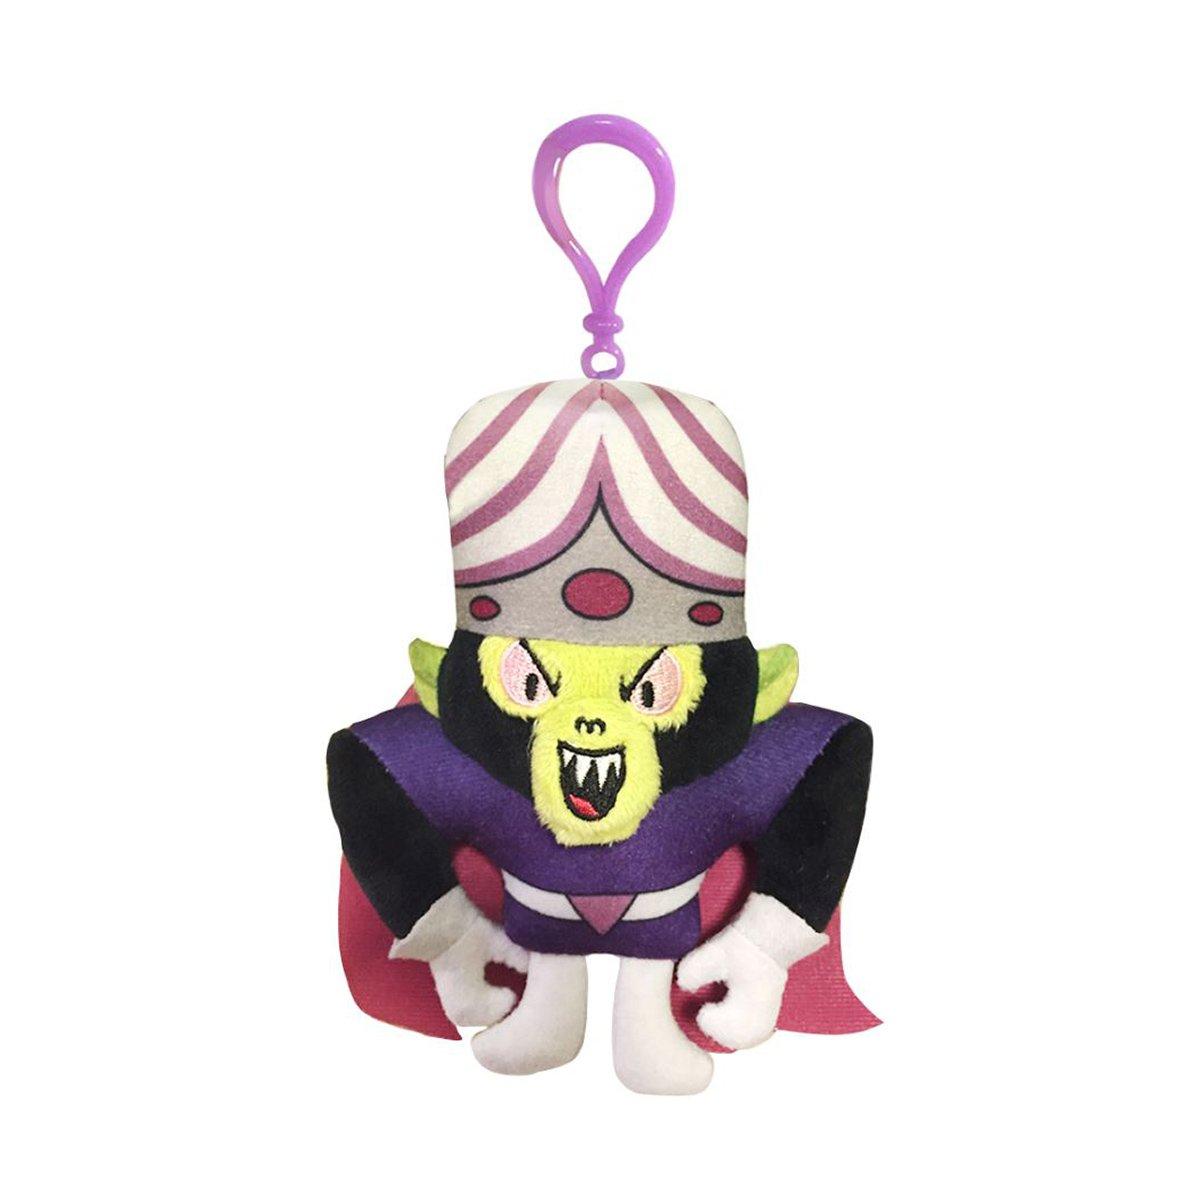 Breloc cu figurina Powerpuff Girls Mojo Jojo